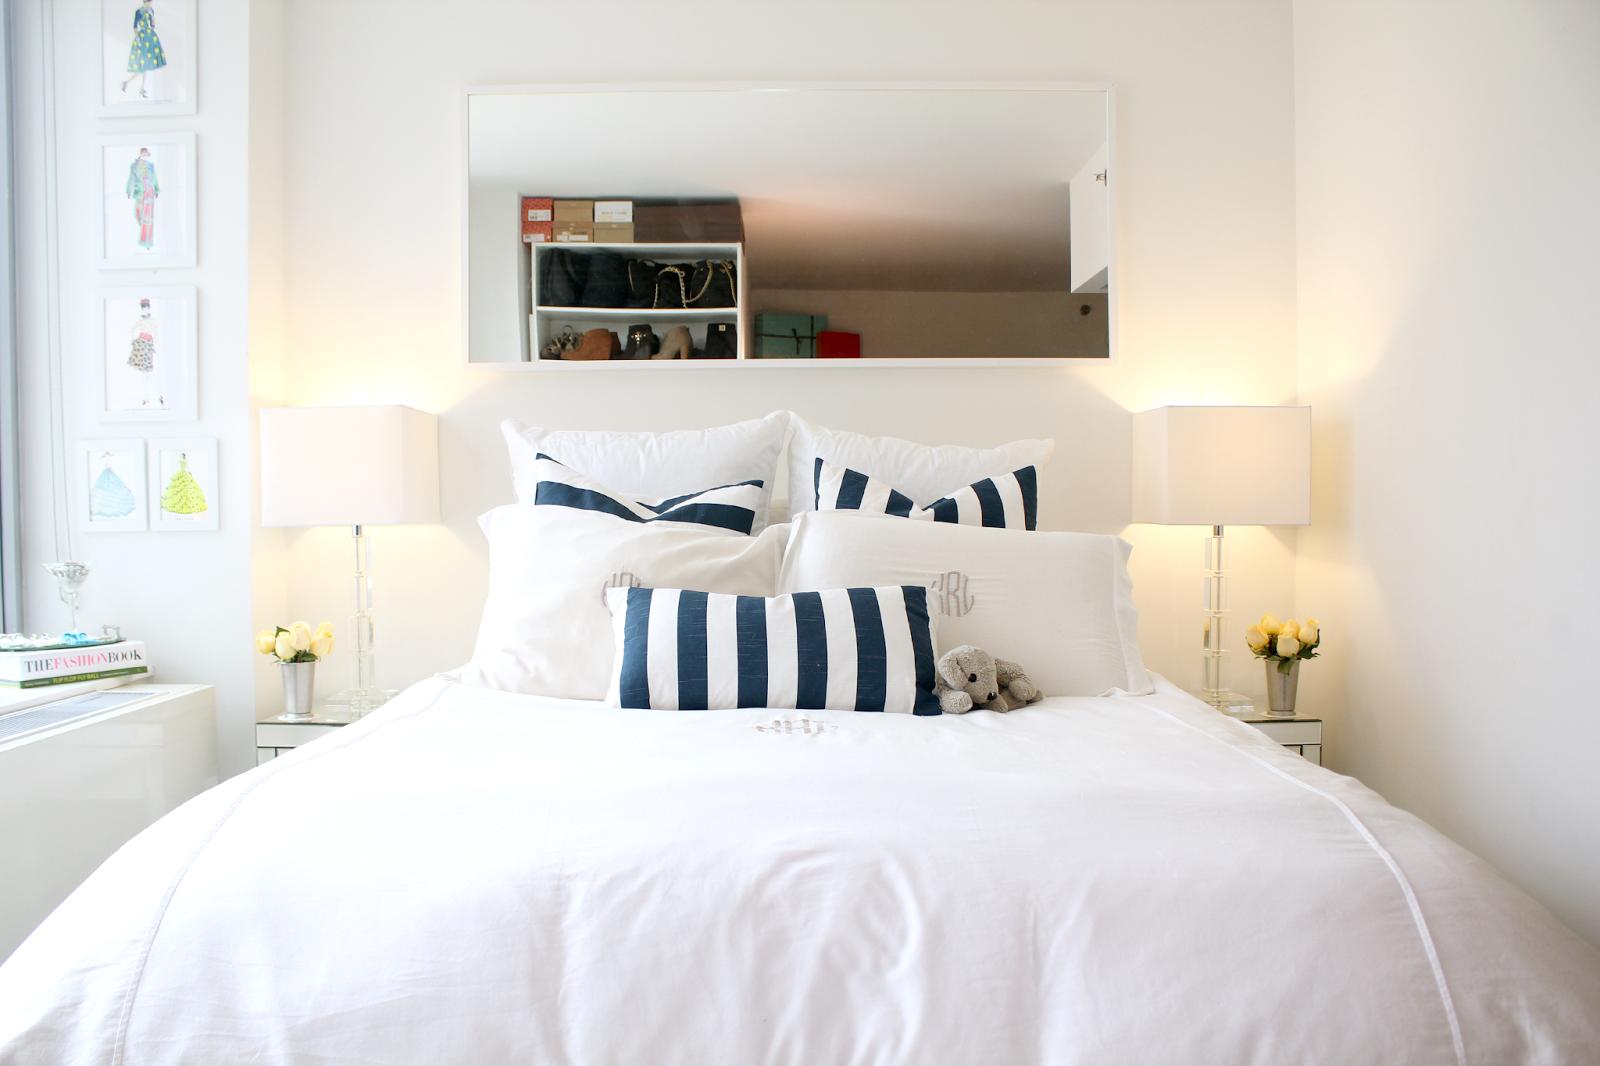 New York City Studio Apartment Tour Part 4 The Bedroom